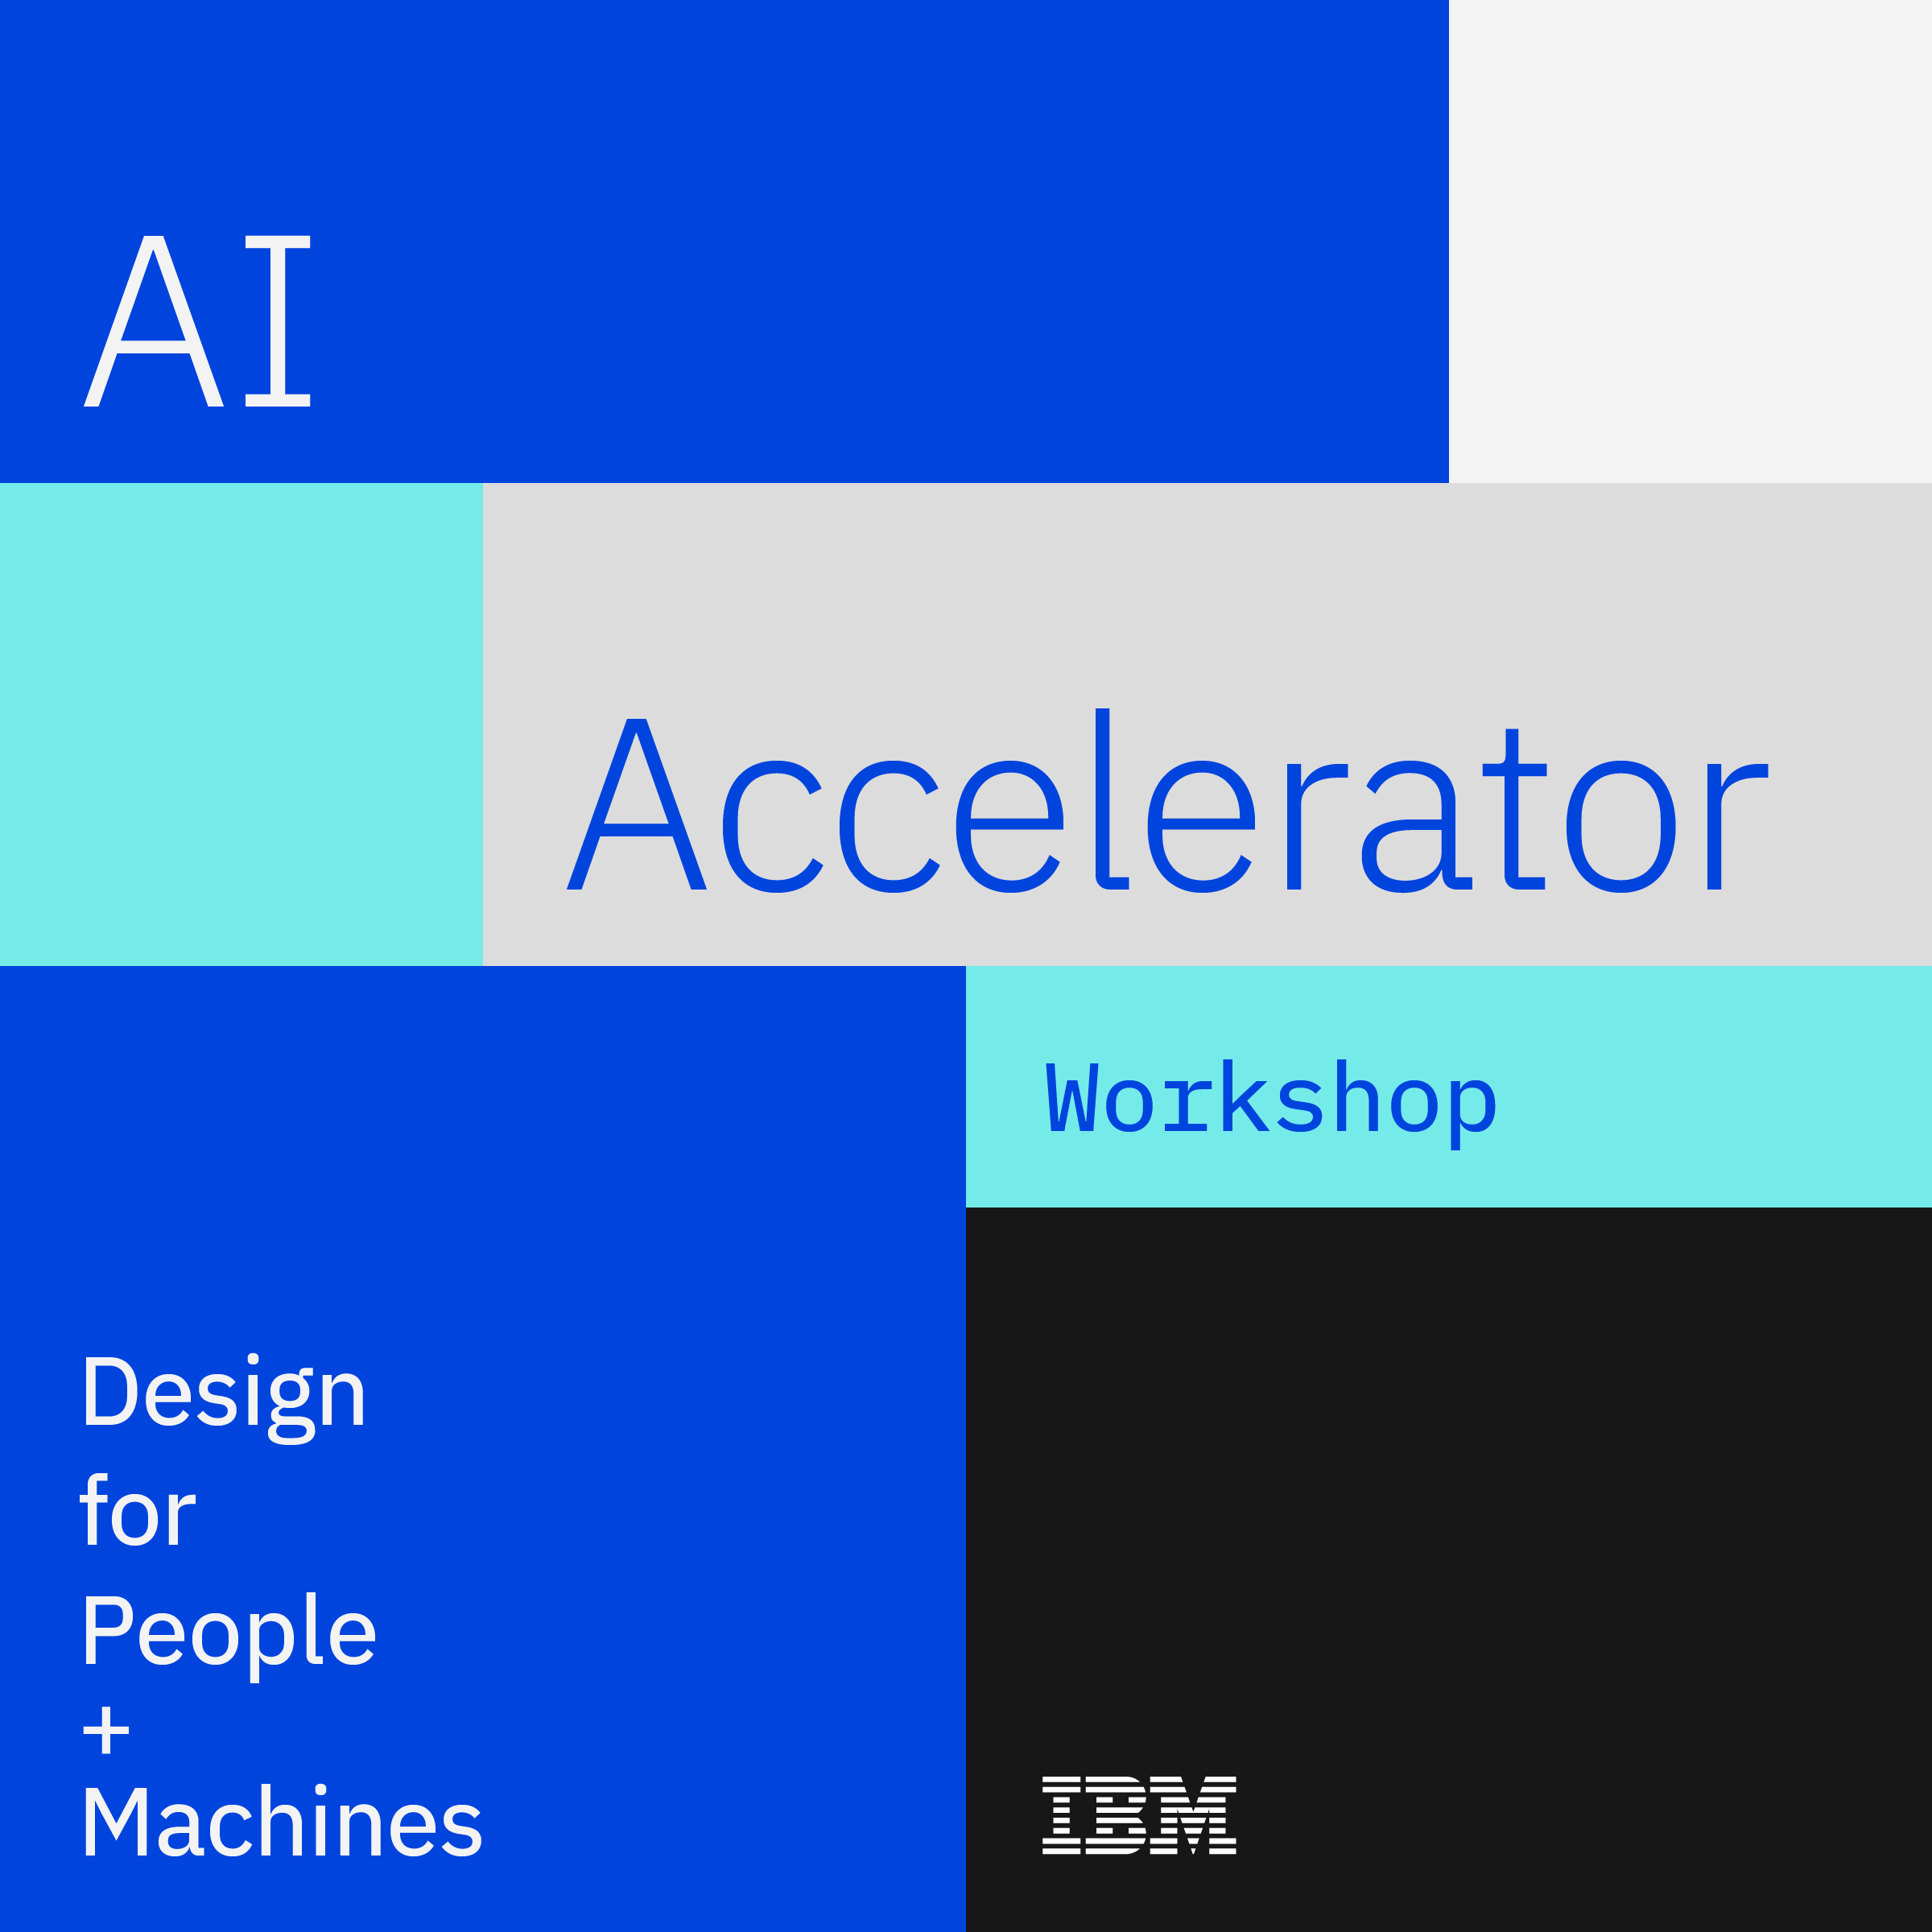 tues_20th_10am4pm_br_ai_accelerator_workshop_ibm